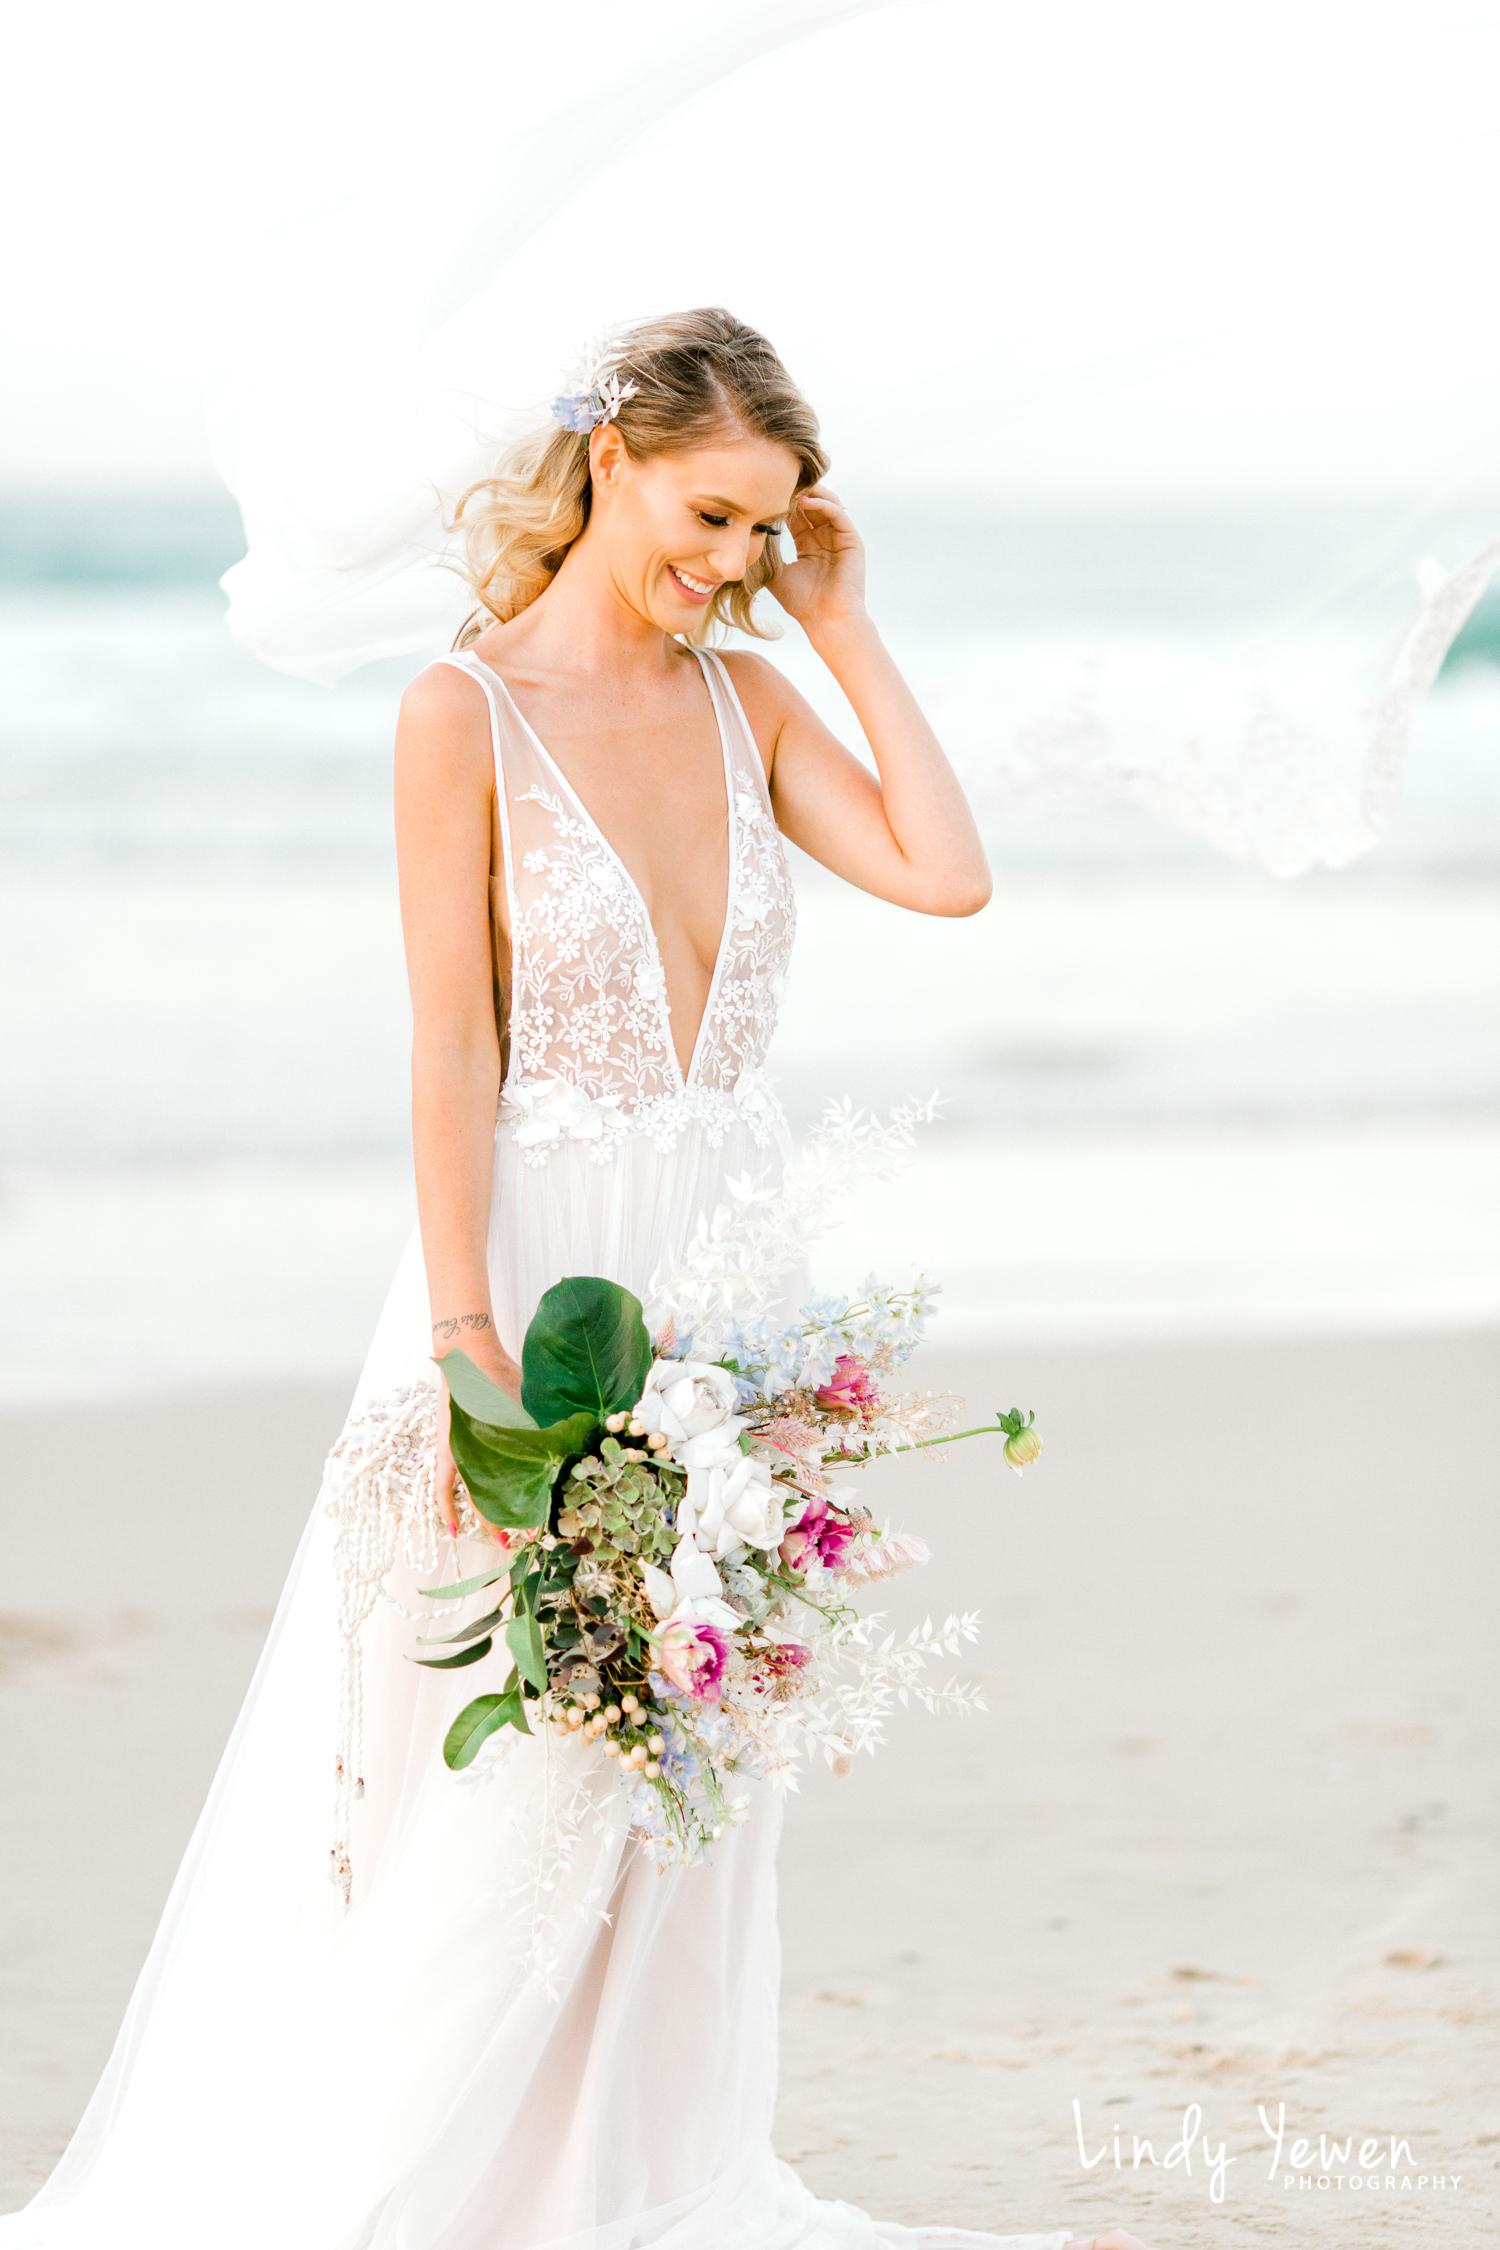 Lindy-Photography-Noosa-Weddings-Grace-Chris 255.jpg